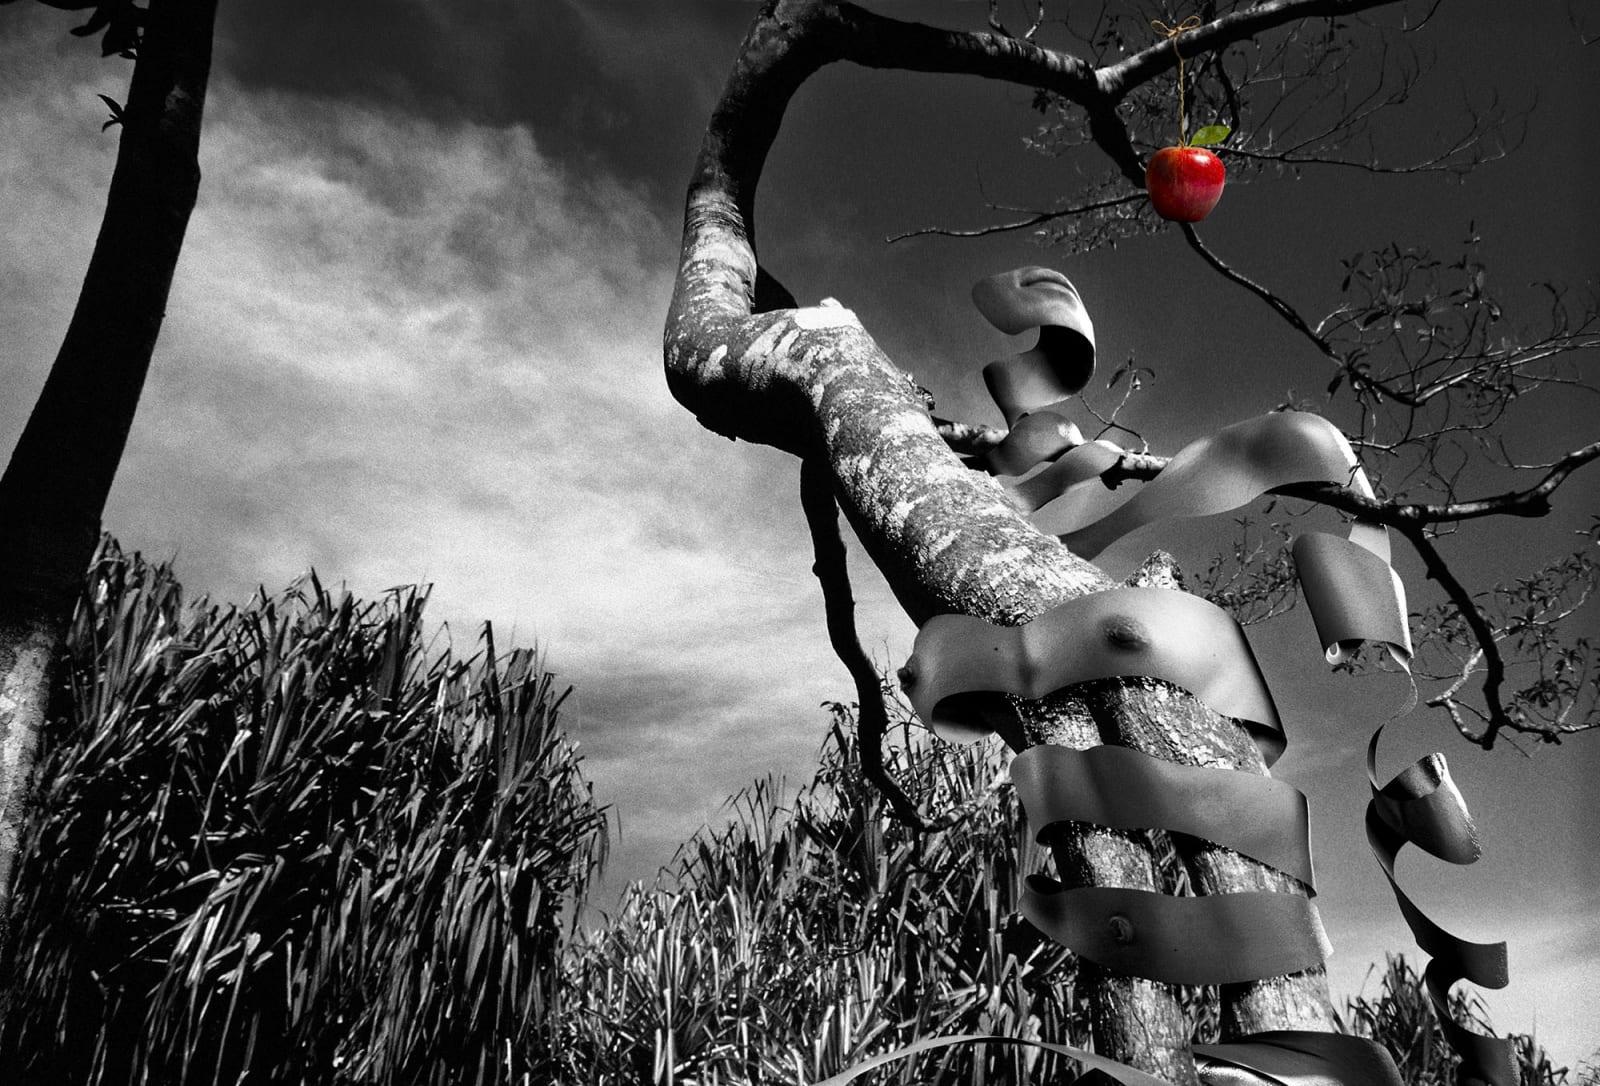 Alain Lacki, Le jardin d'Eden, 2008